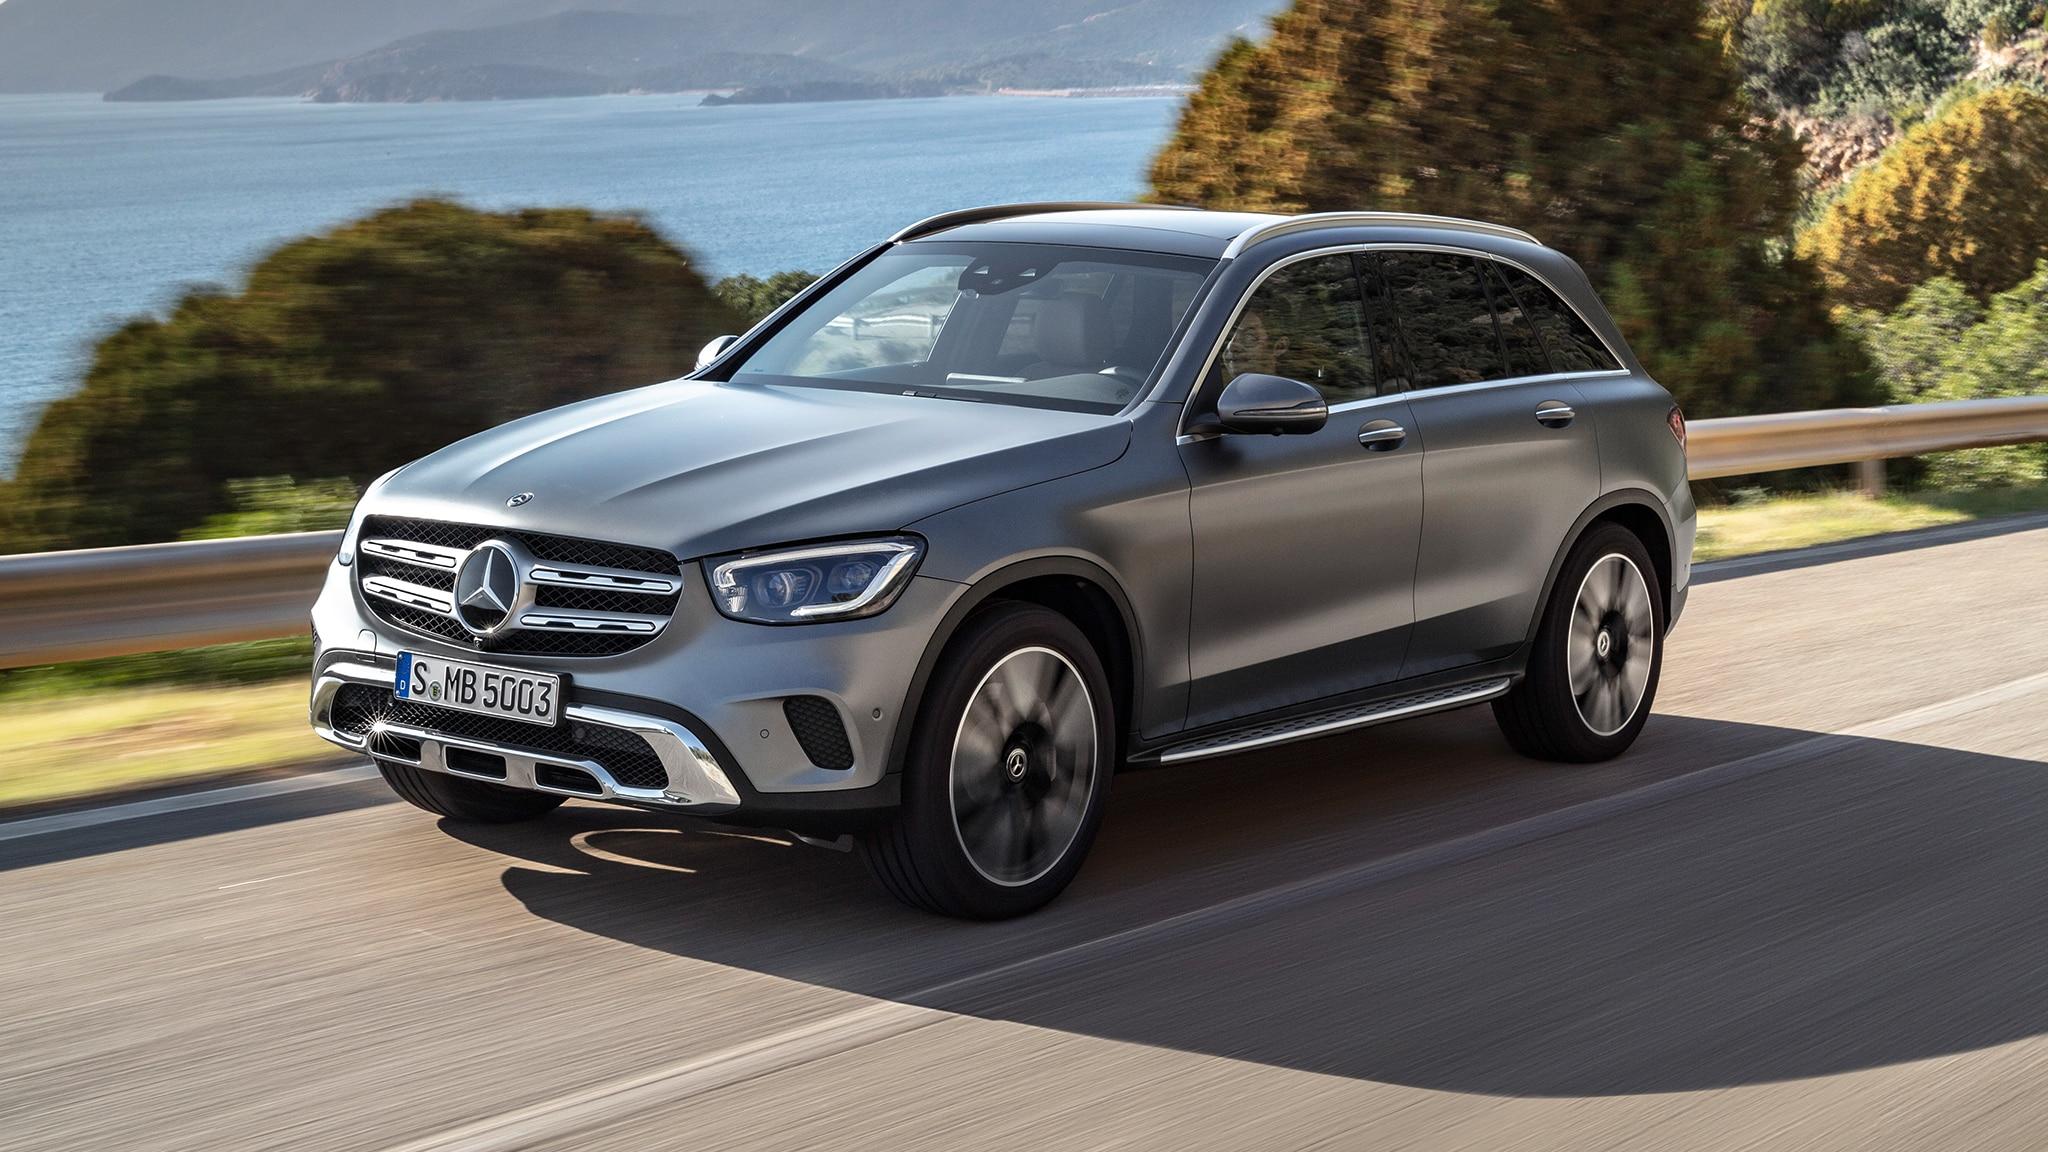 2020 Mercedes-Benz GLC-class Refresh Brings MBUX Digital Assistant   Automobile Magazine